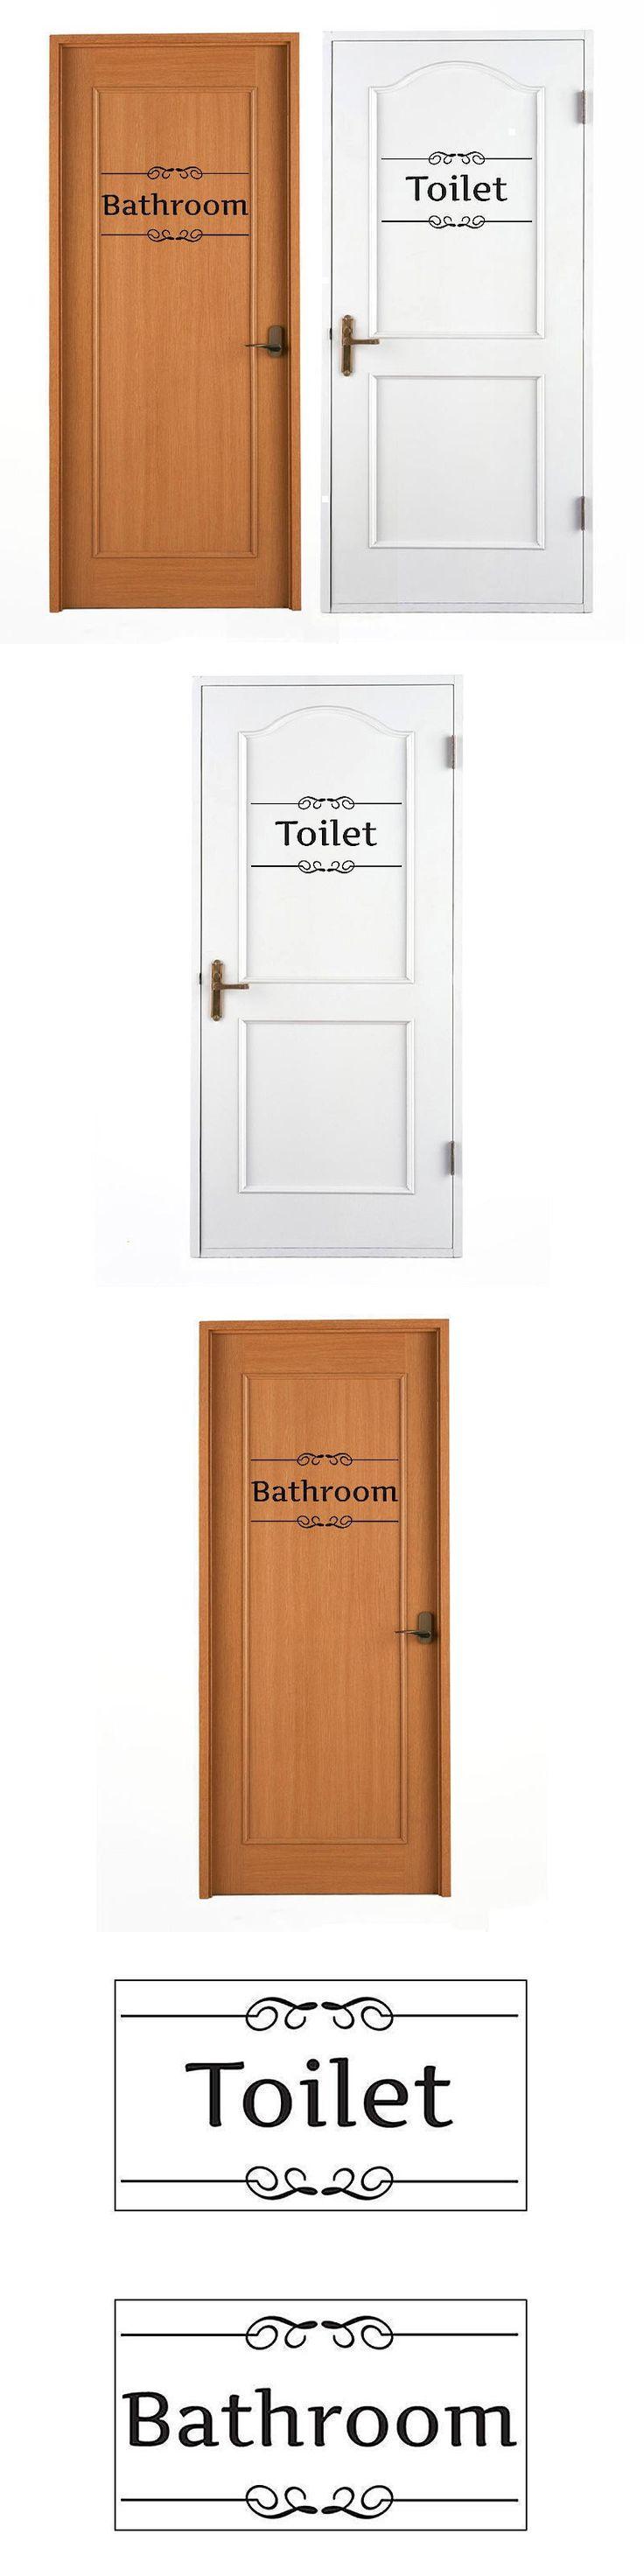 best door remodel images on pinterest home ideas bathroom and